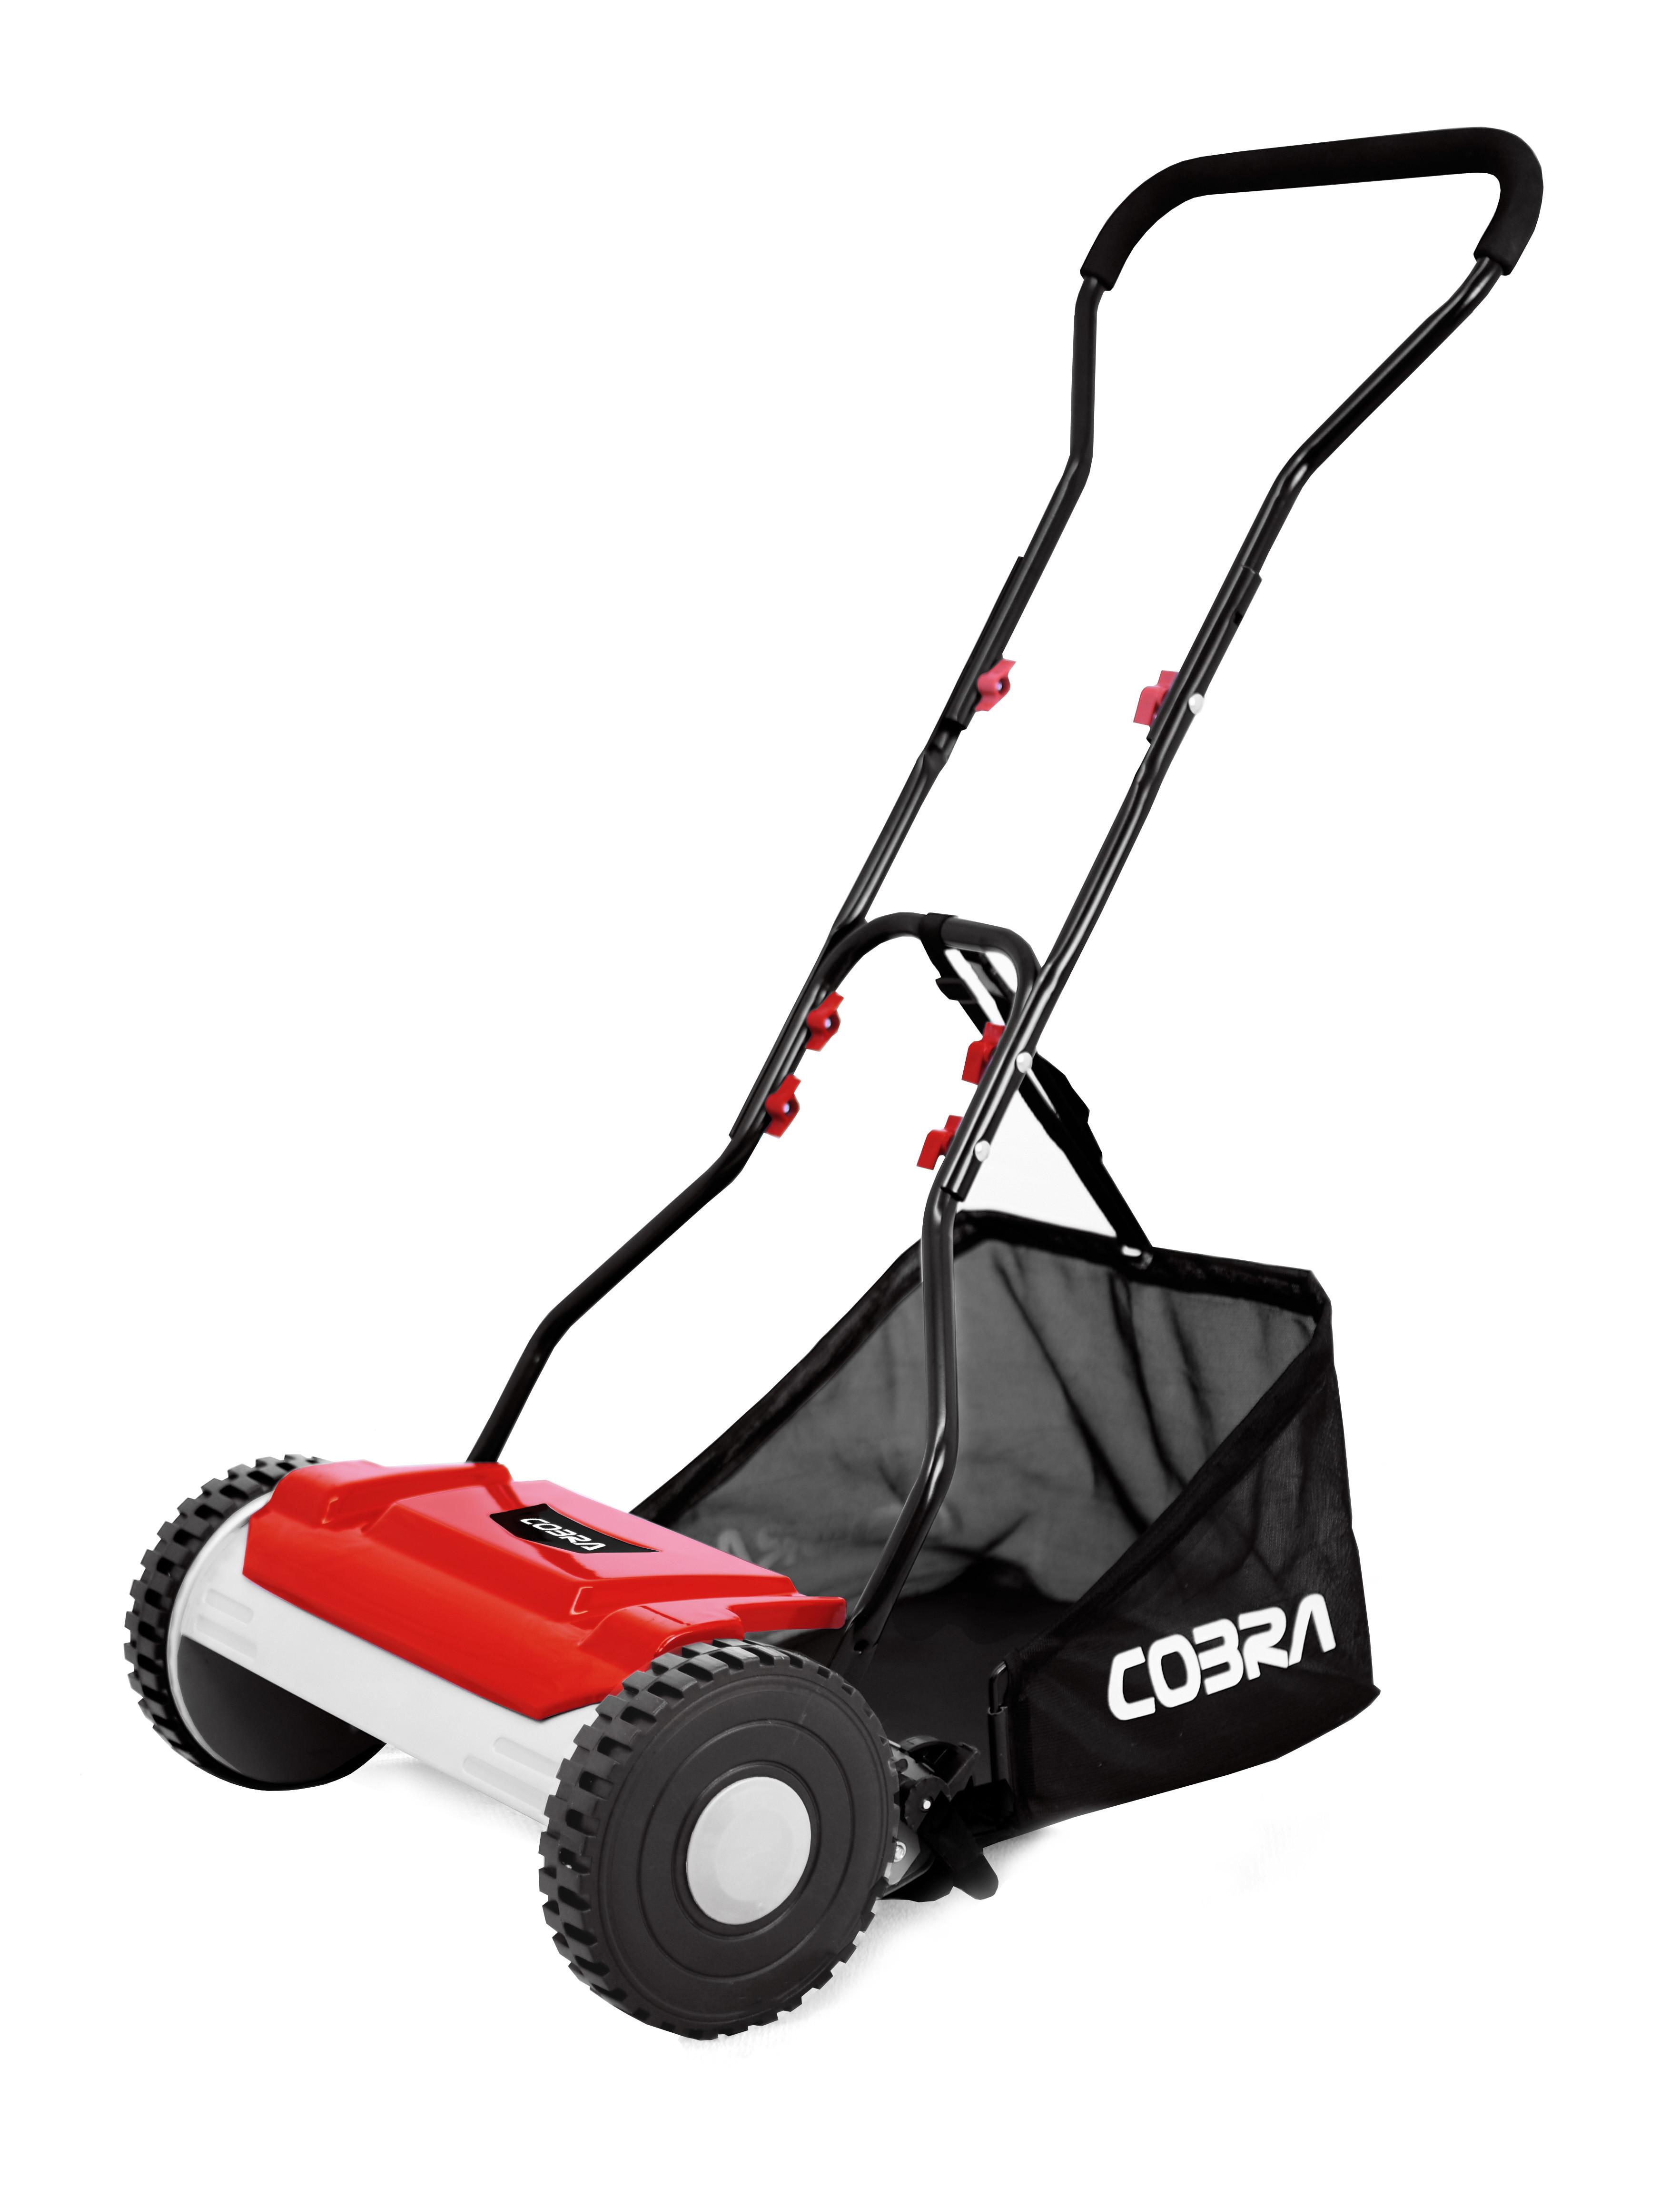 HM381 Lawnmower